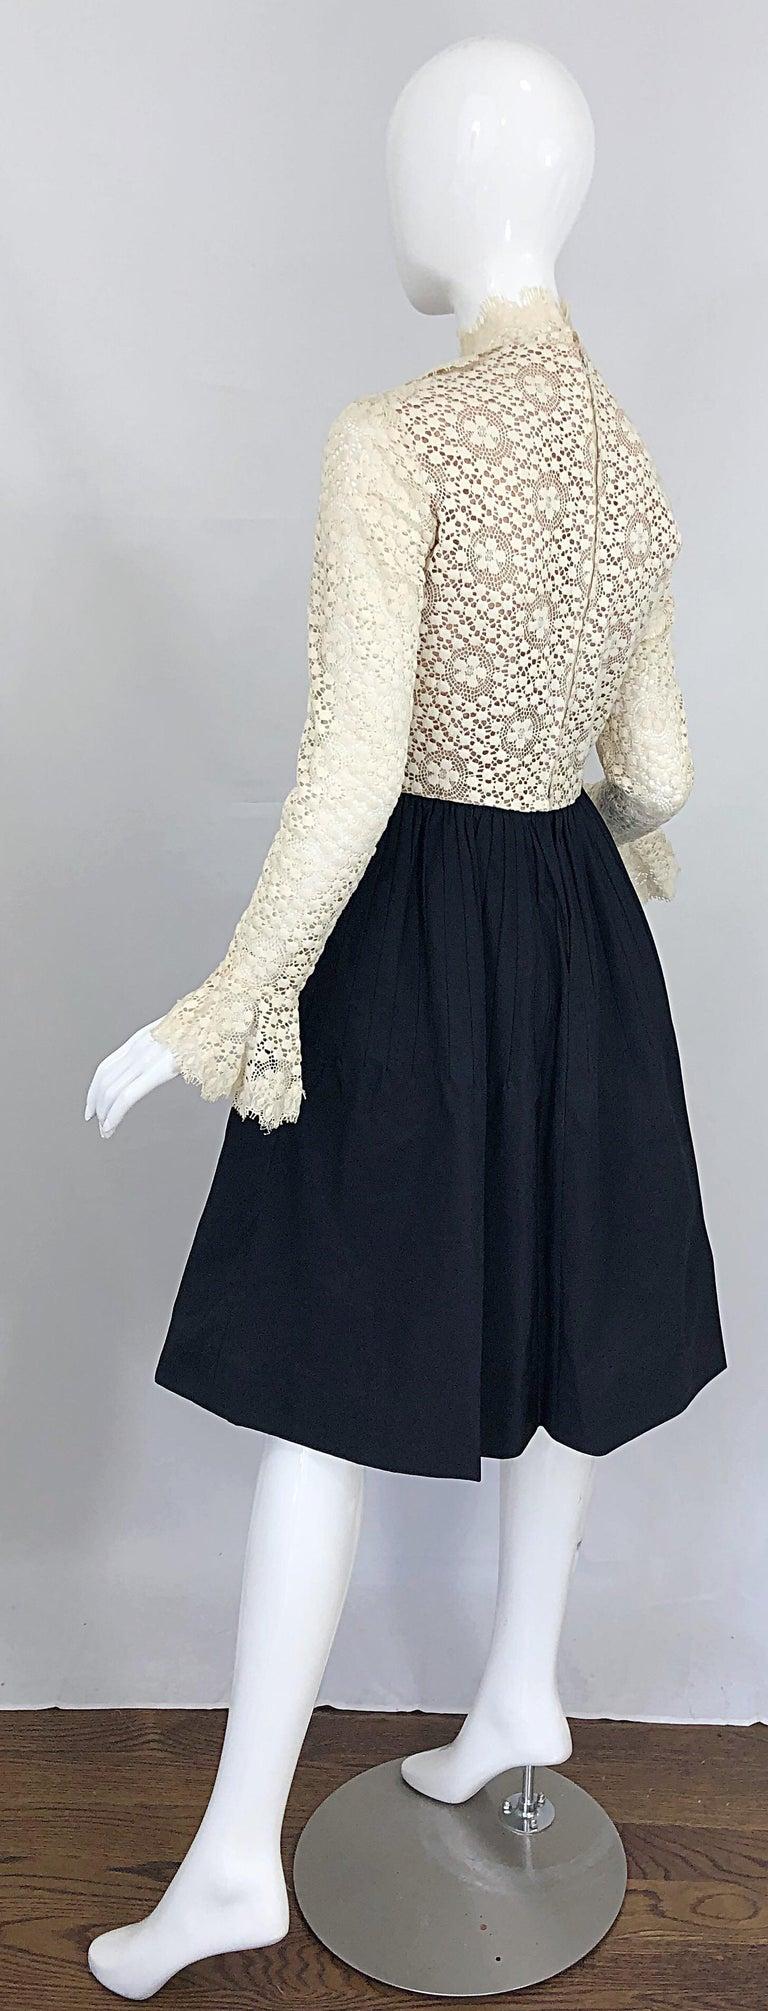 1960s Geoffrey Beene Ivory Crochet and Black Silk Taffeta Vintage 60s Dress For Sale 9